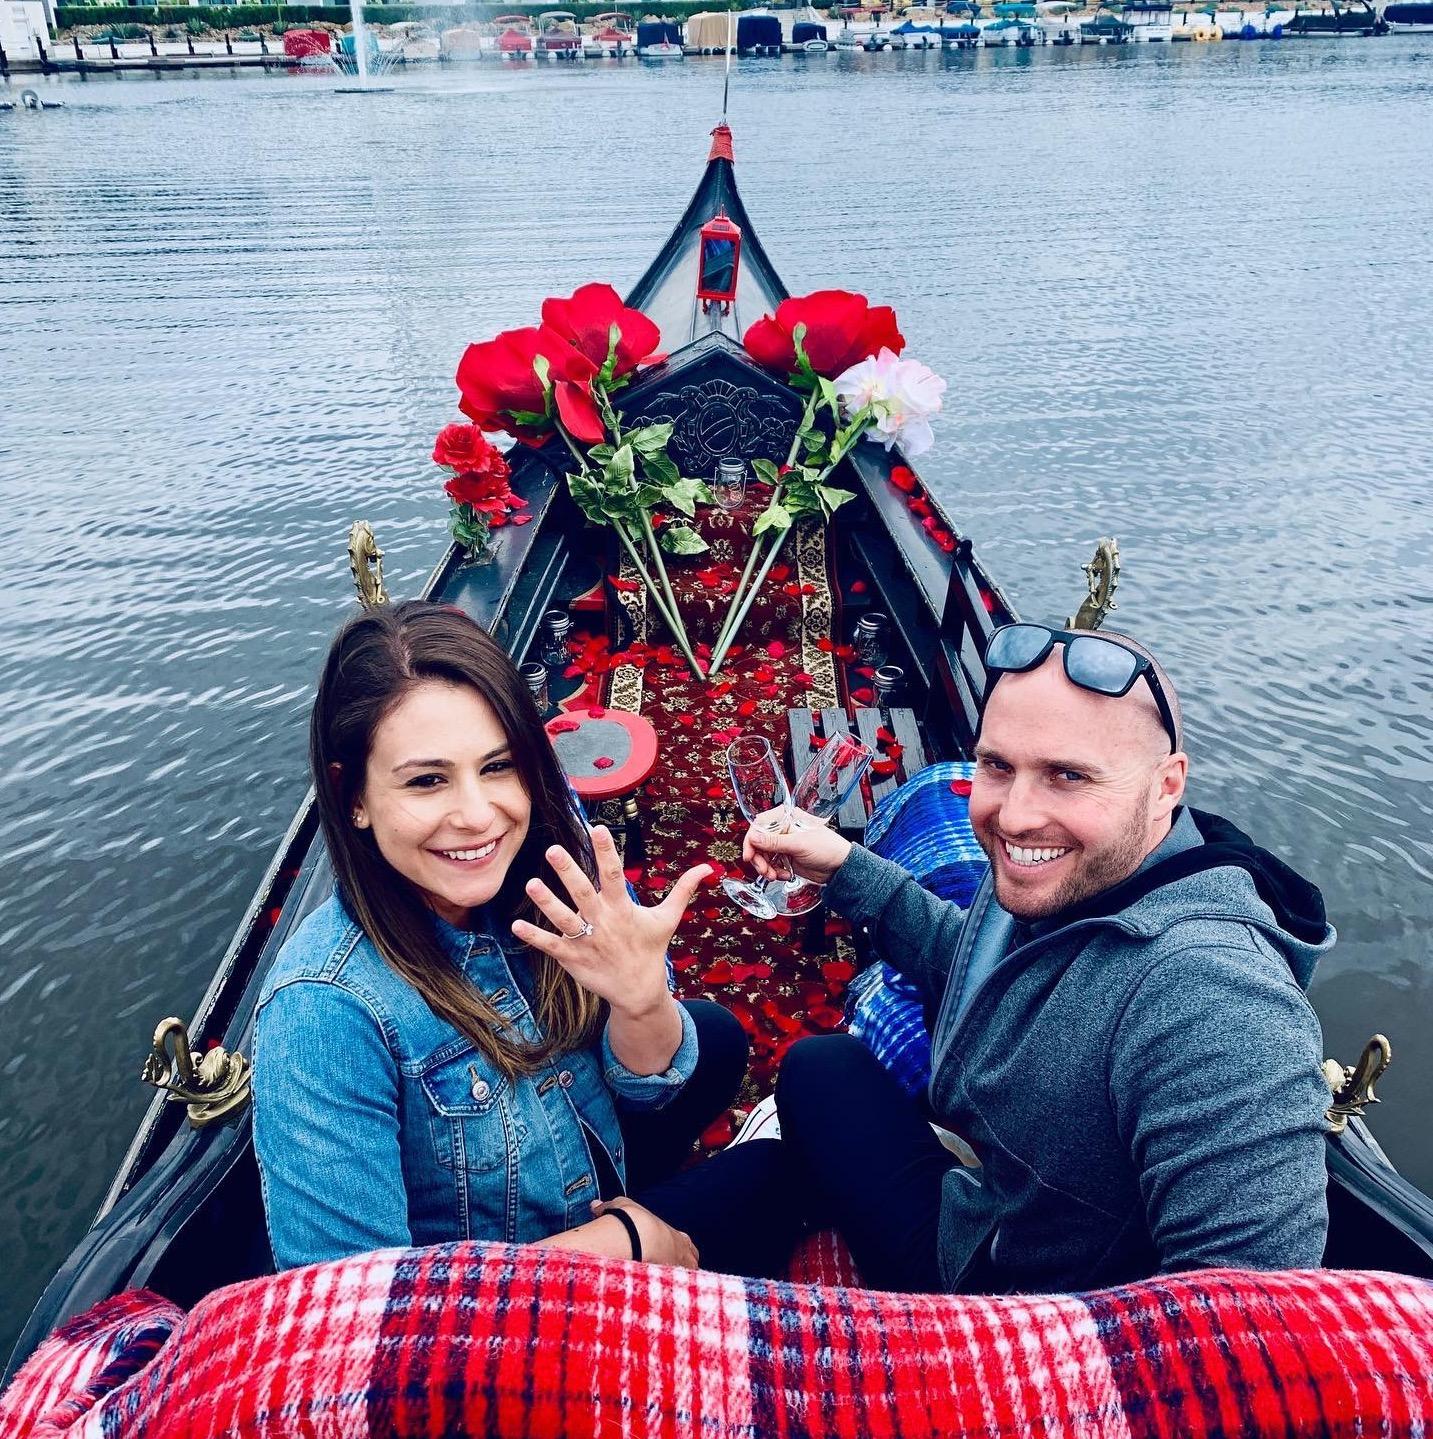 Romantic Wedding Proposal | Awesome San Diego Date Night